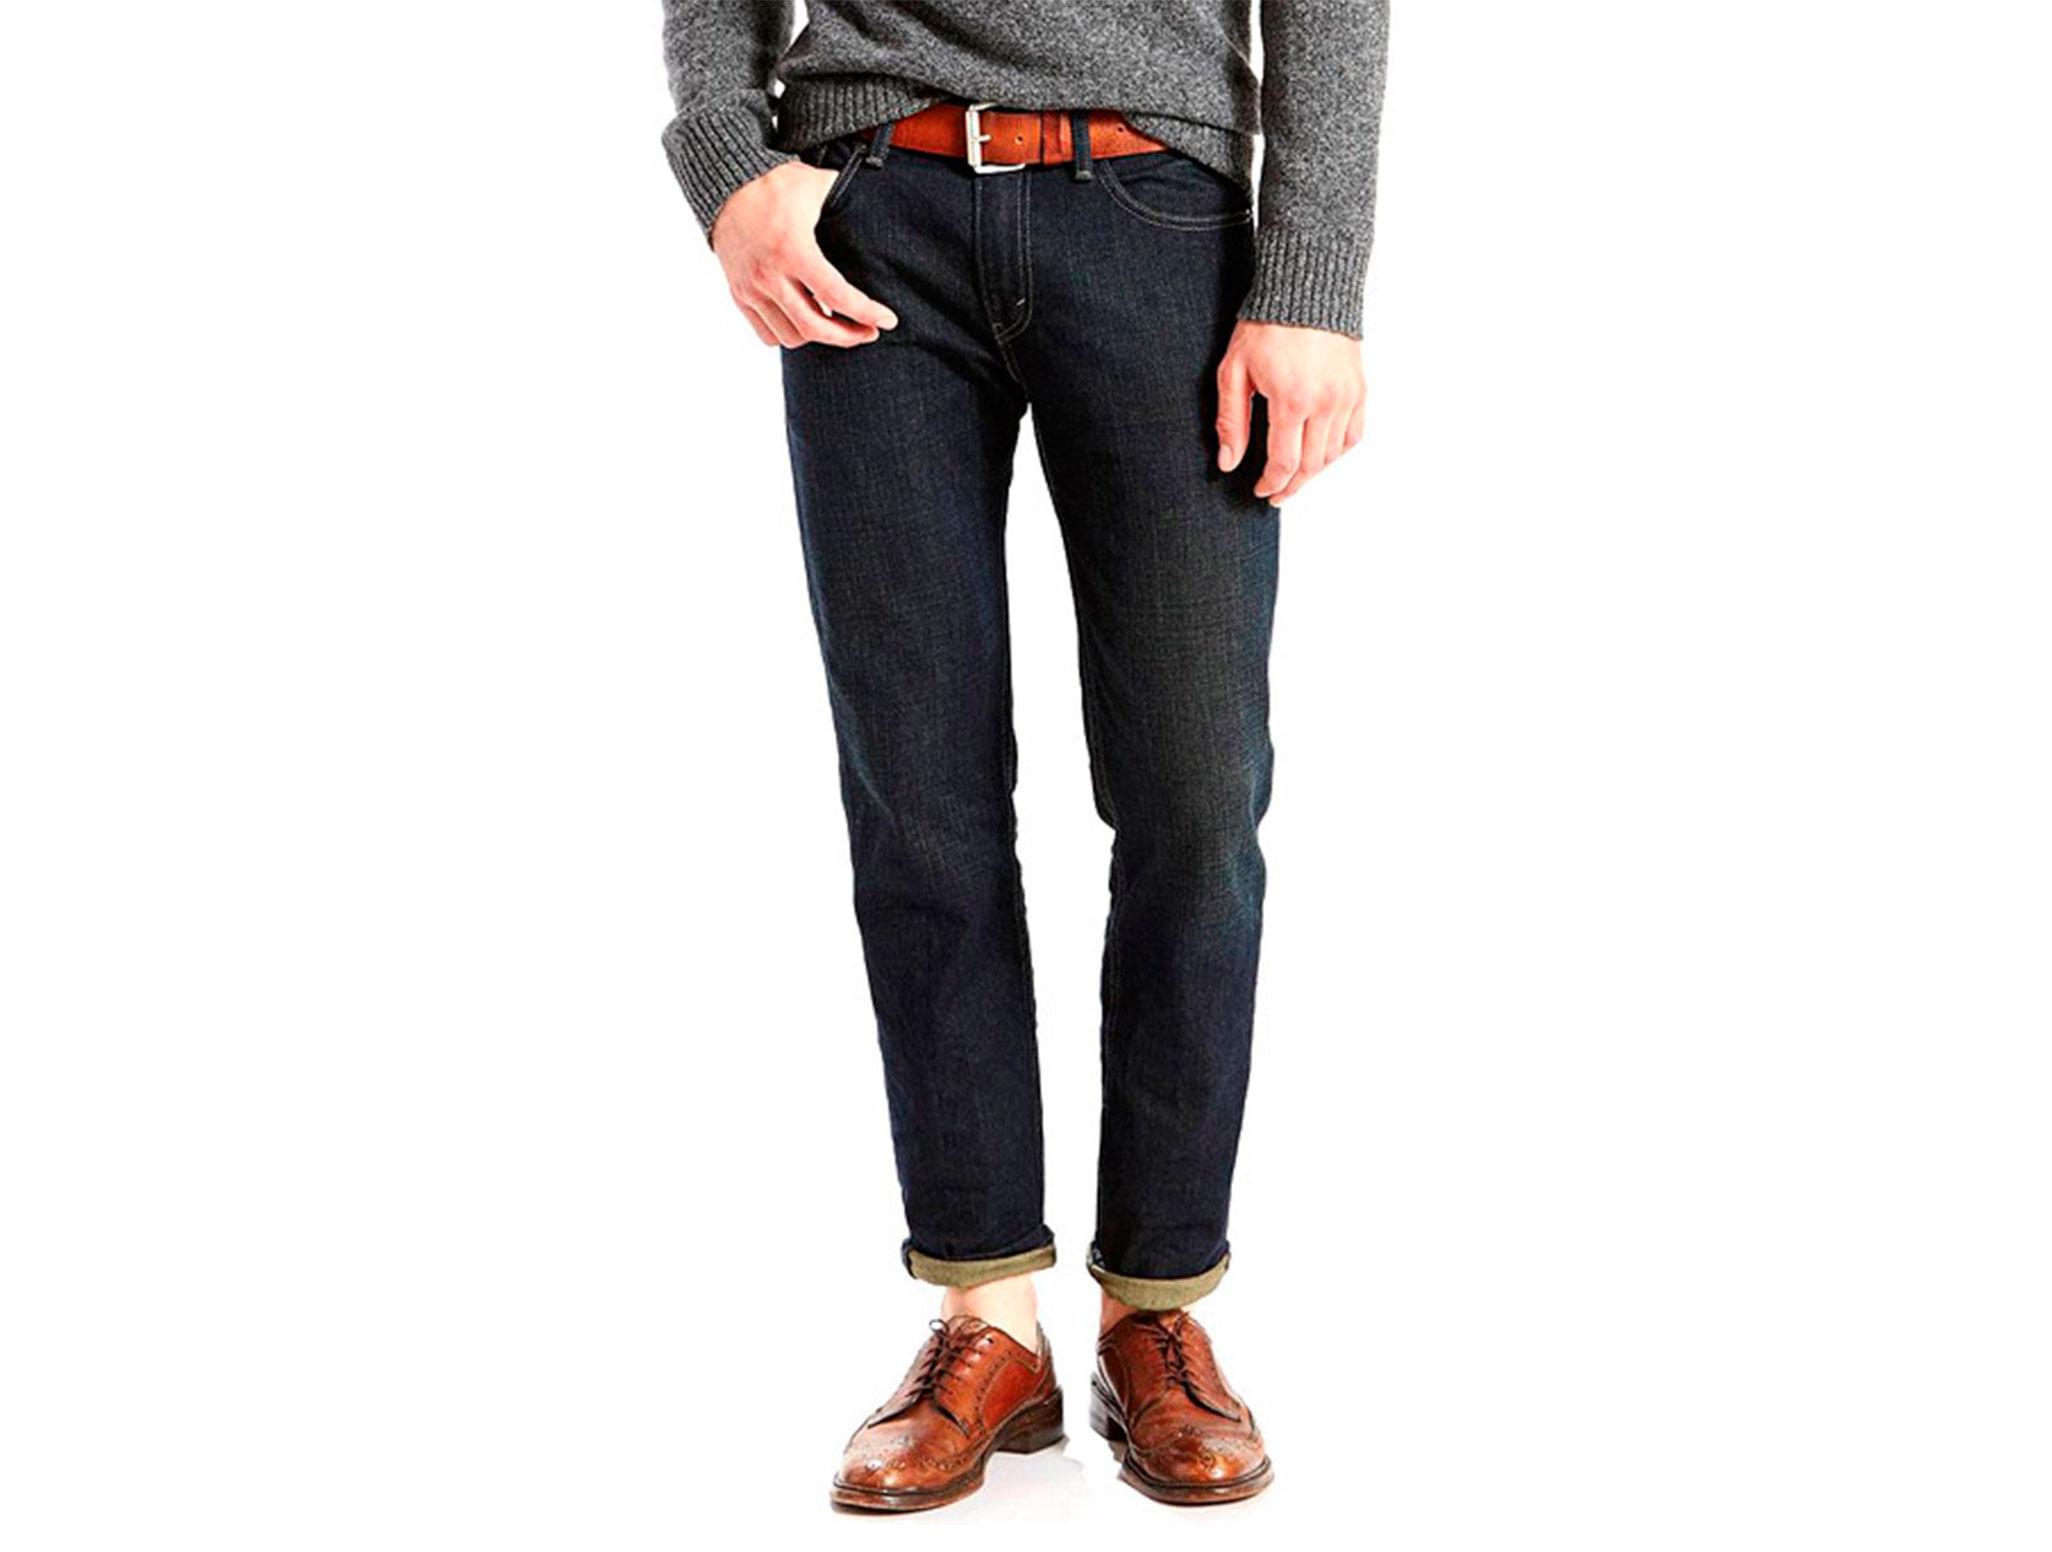 Jeans Levi S 511 Corte Slim 045114172 Surtidoradepartamental